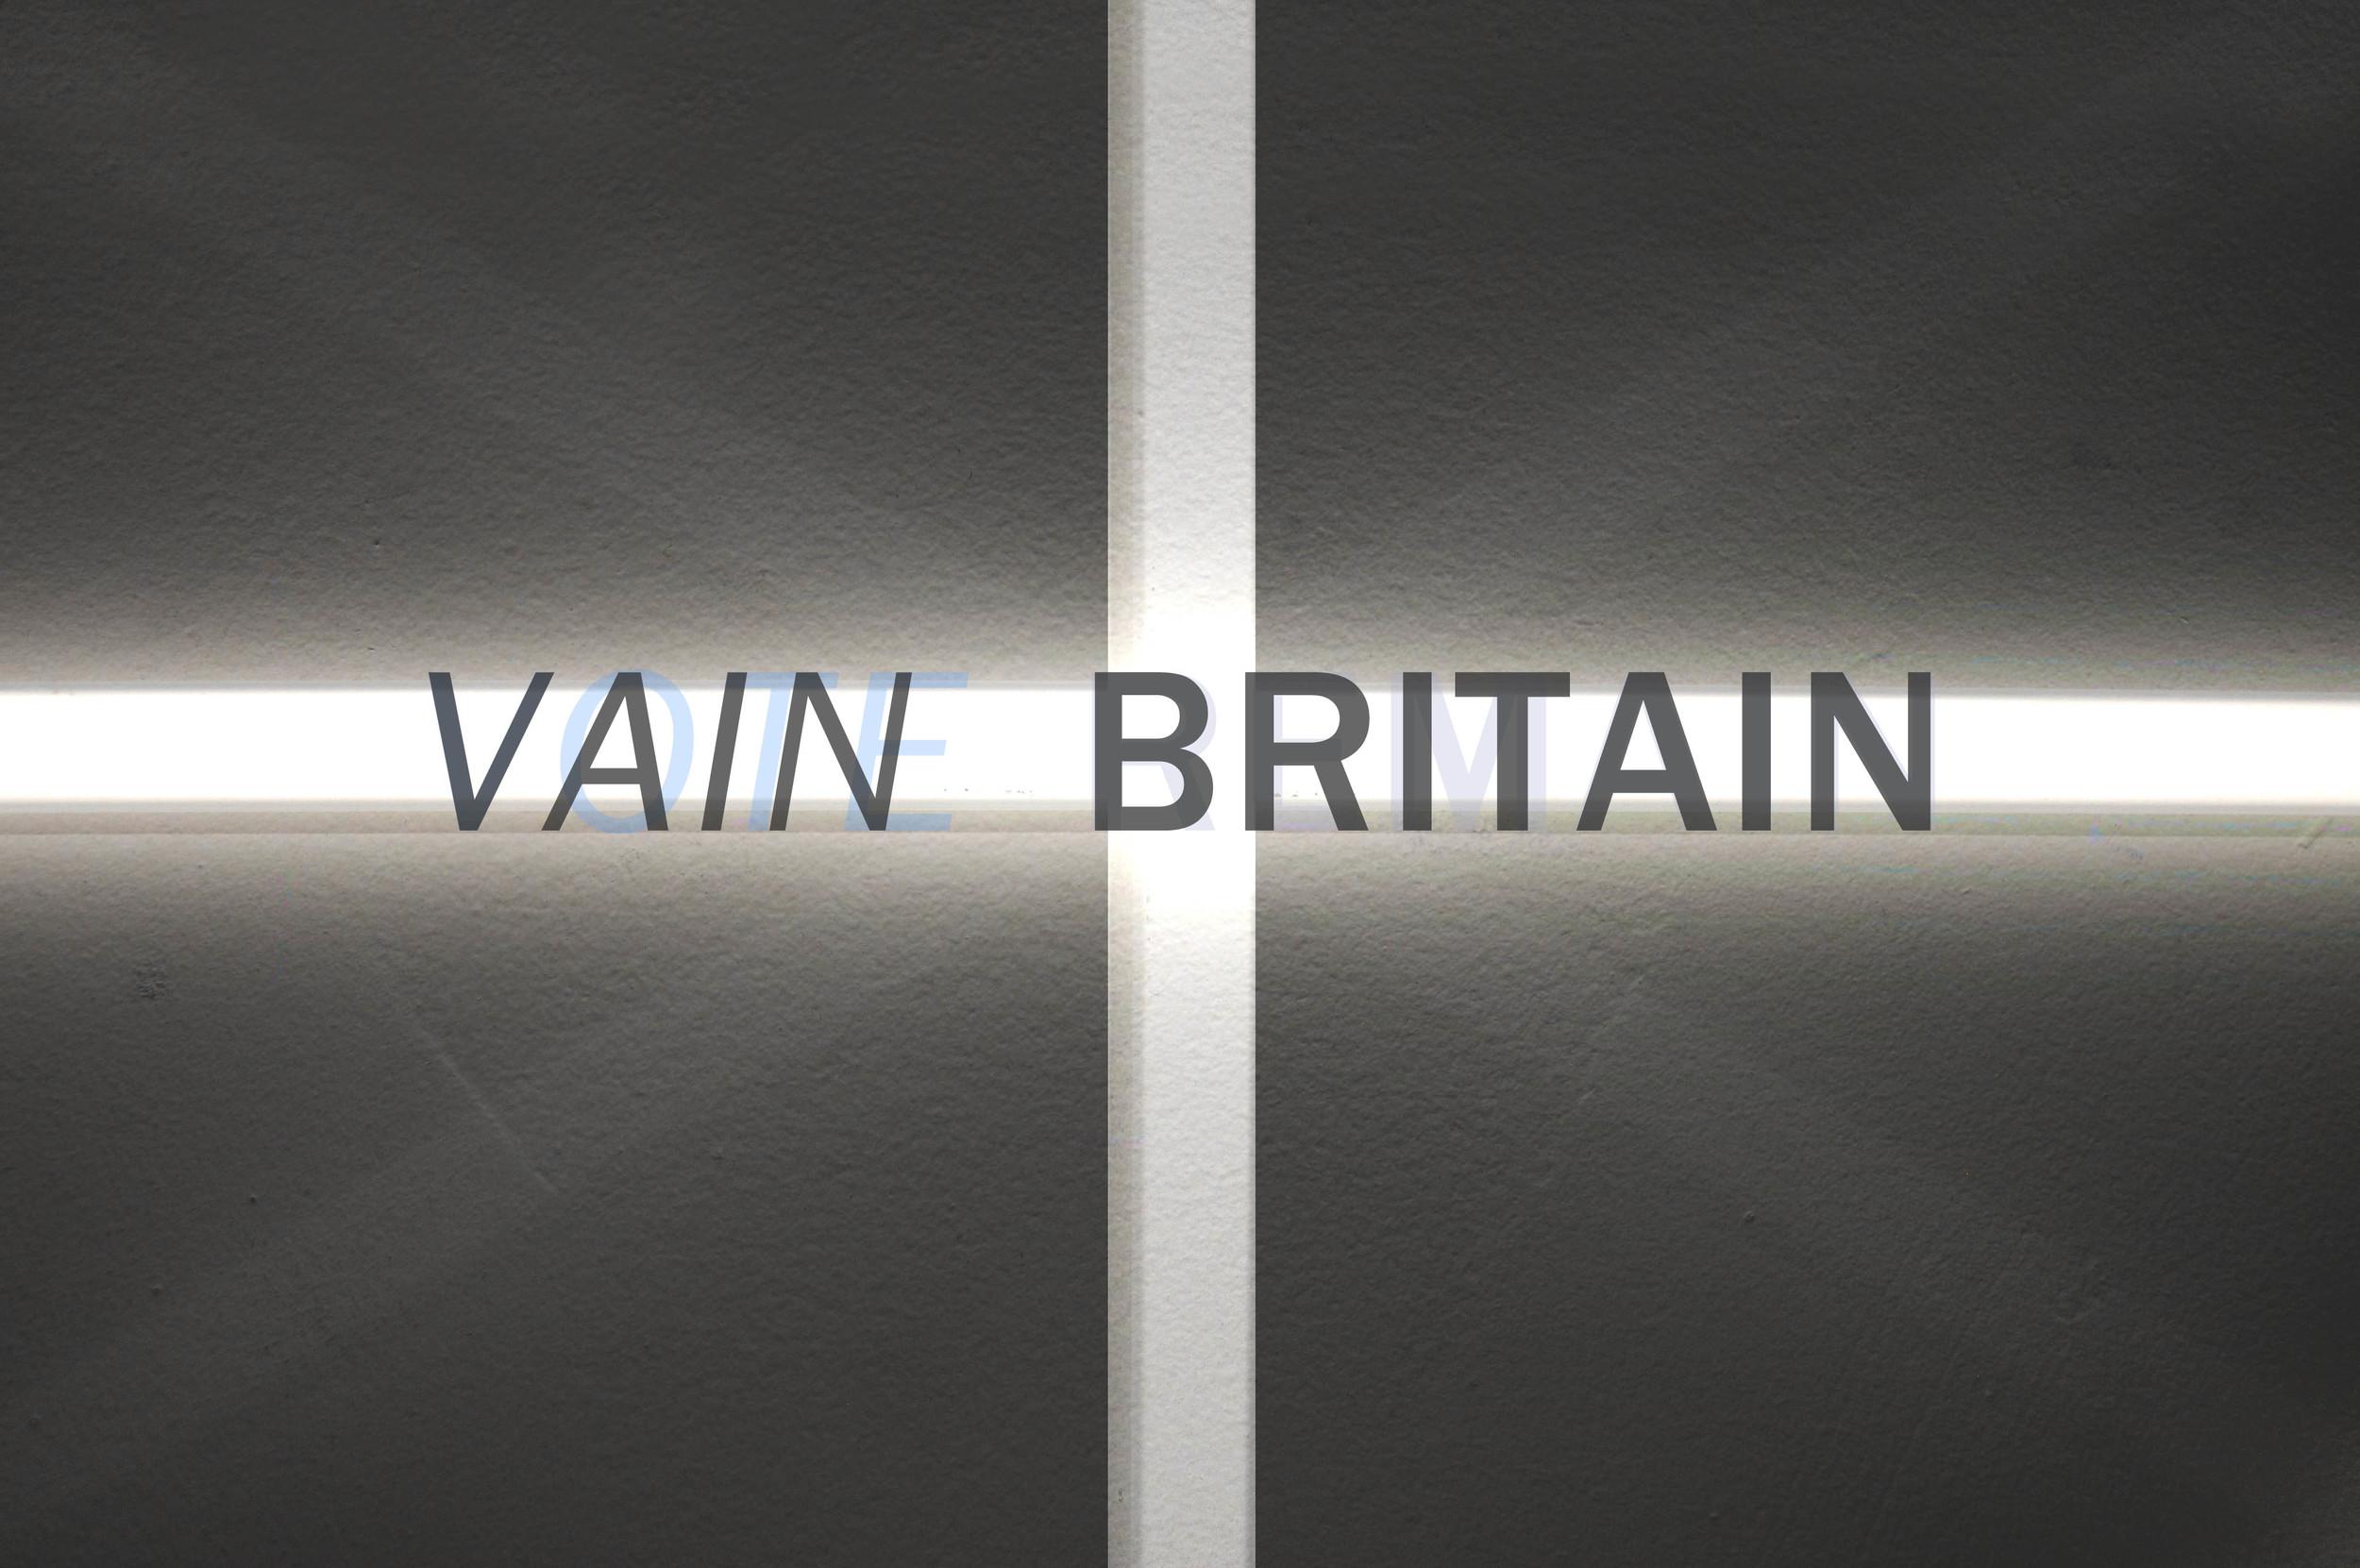 vain britain.jpg